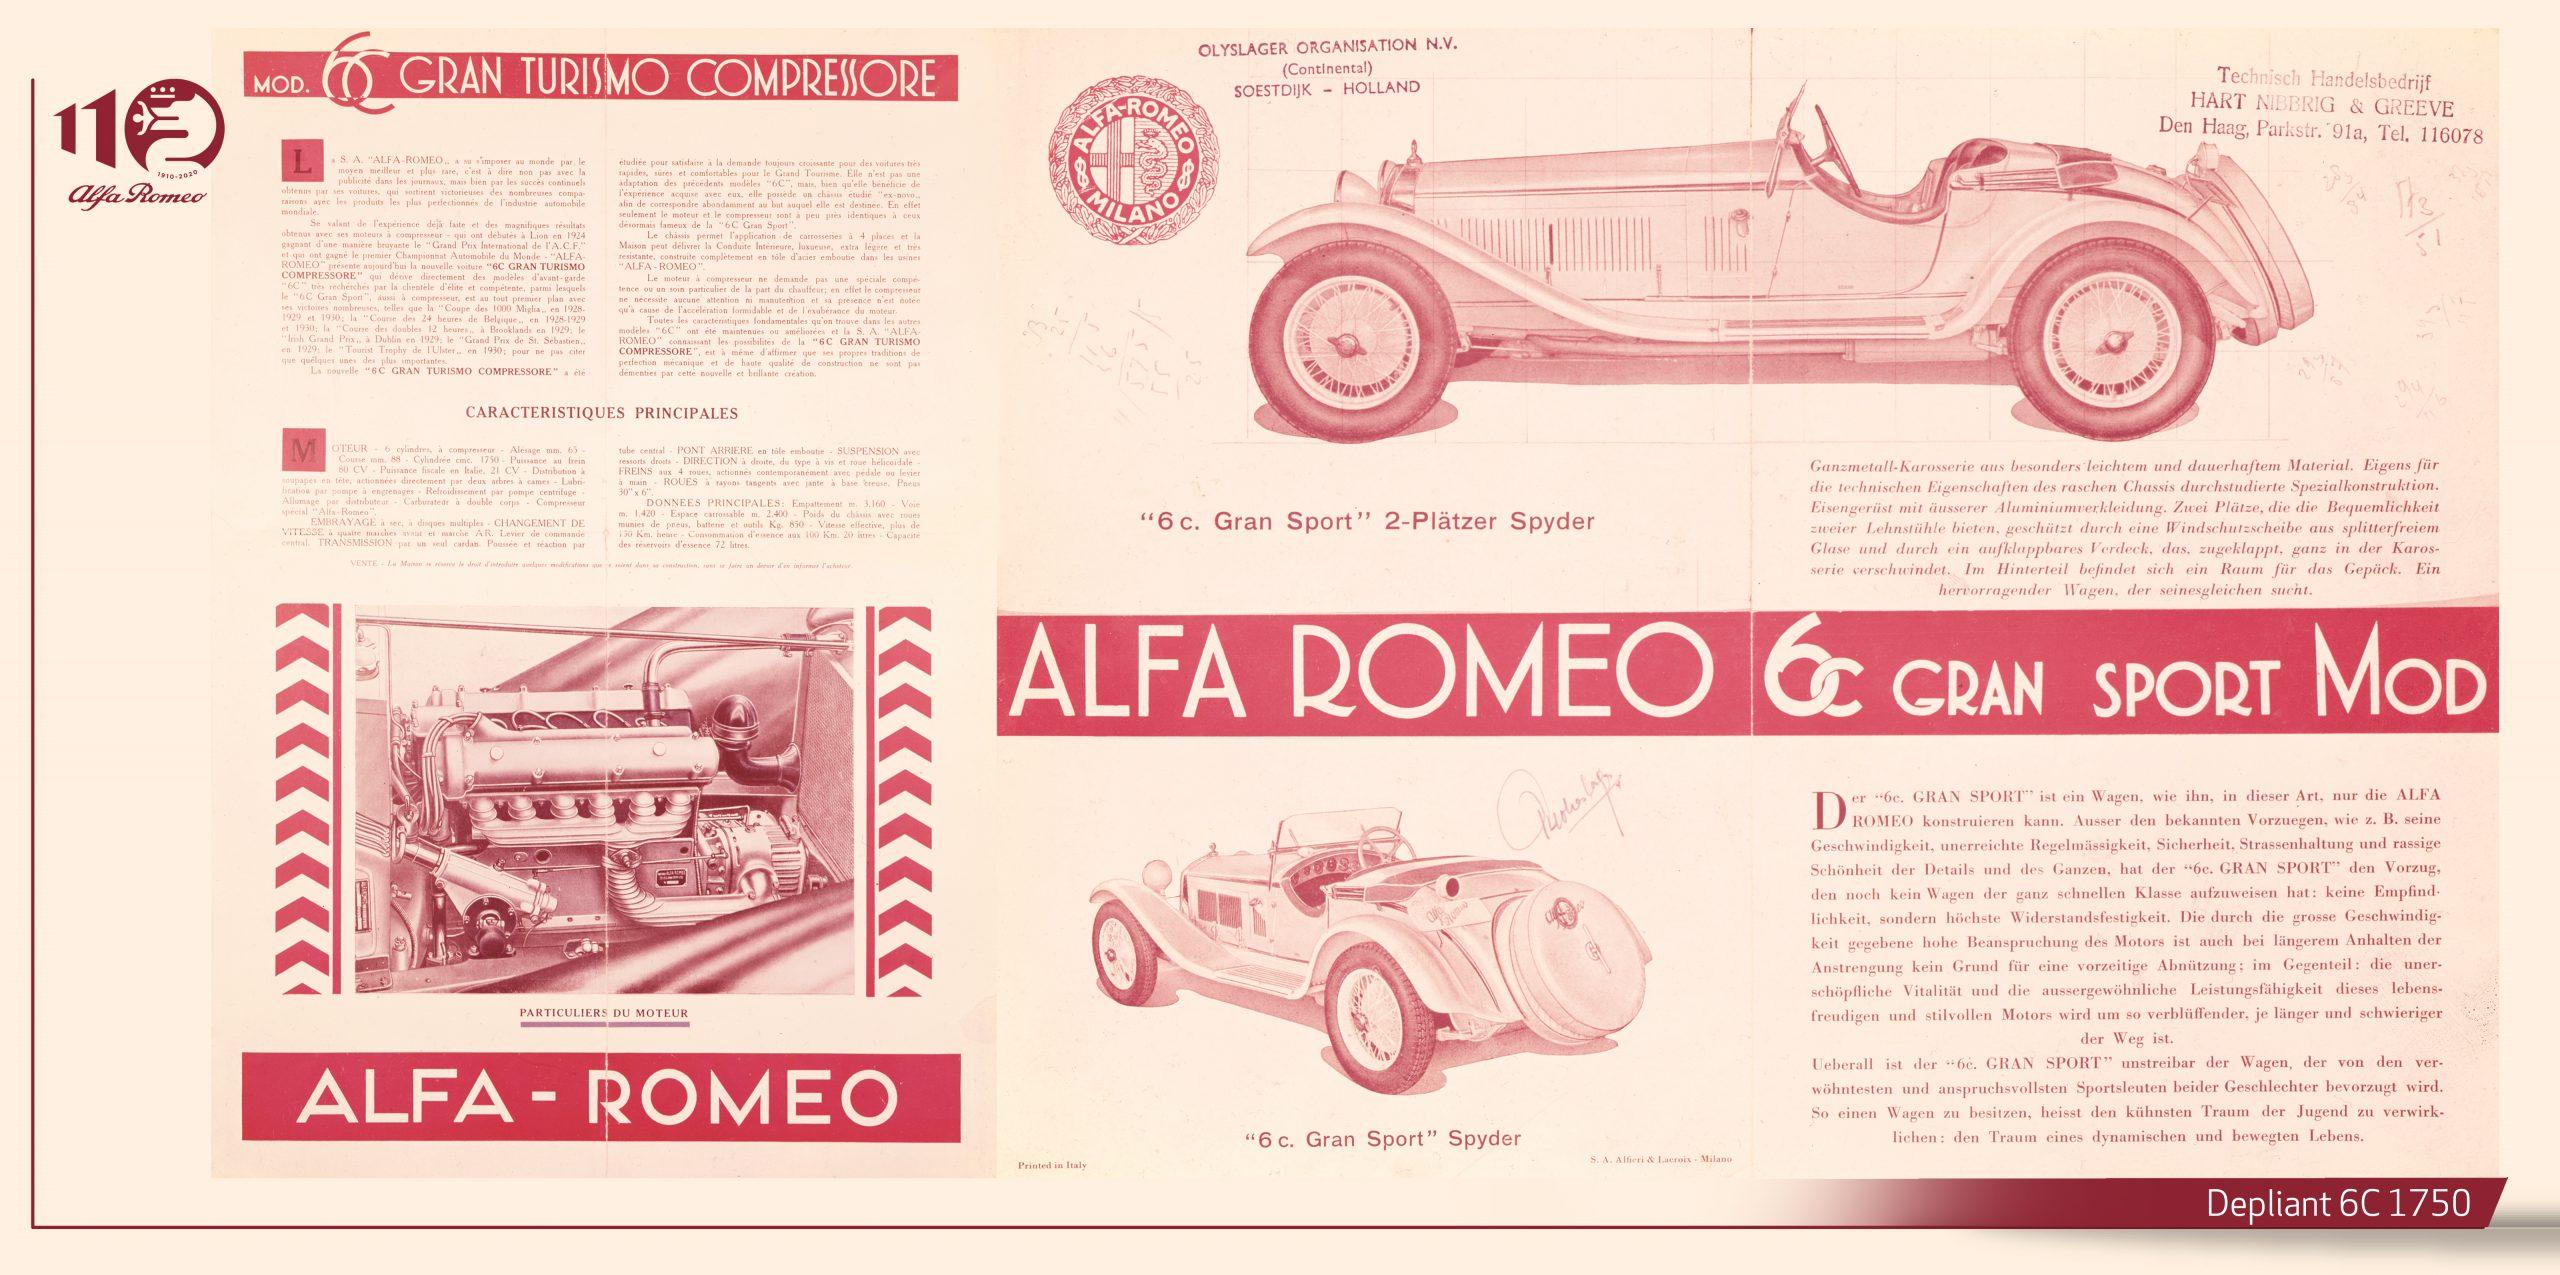 Depliant Alfa Romeo 6c